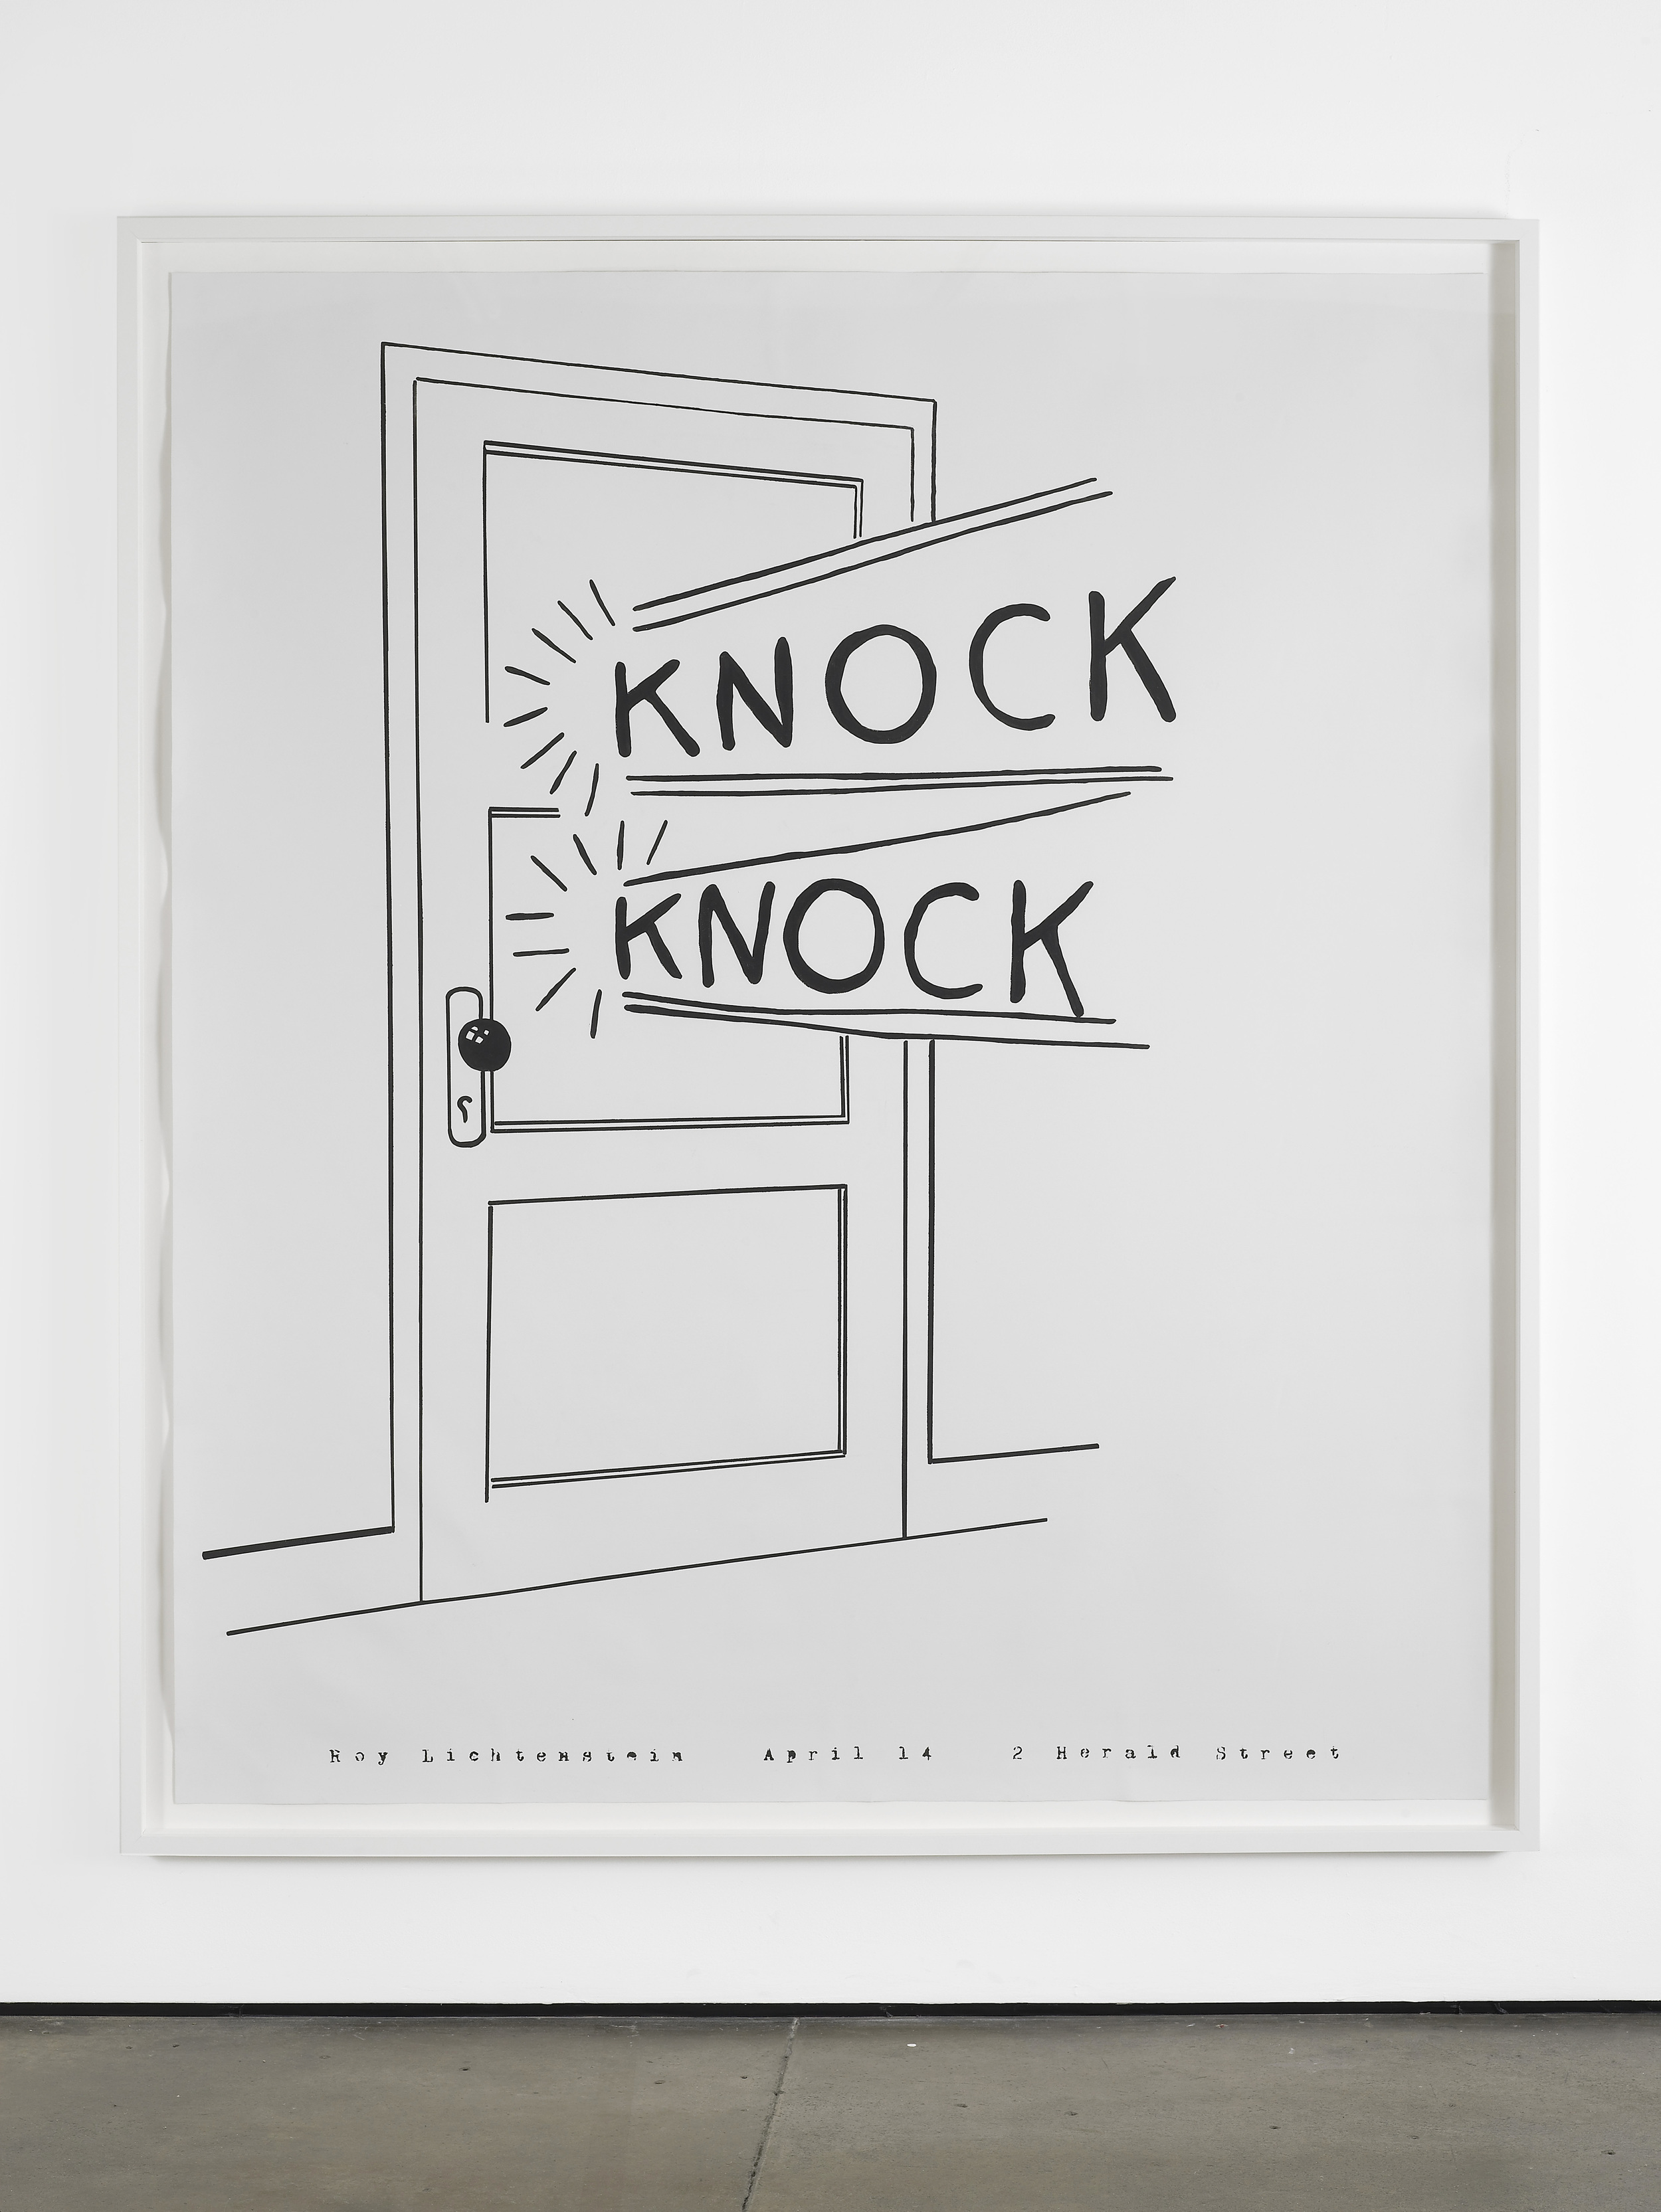 Marc Hundley Knock Knock 2012 Acrylic on canvas 226 x 193.7 cm / 89 x 76.3 in, unframed